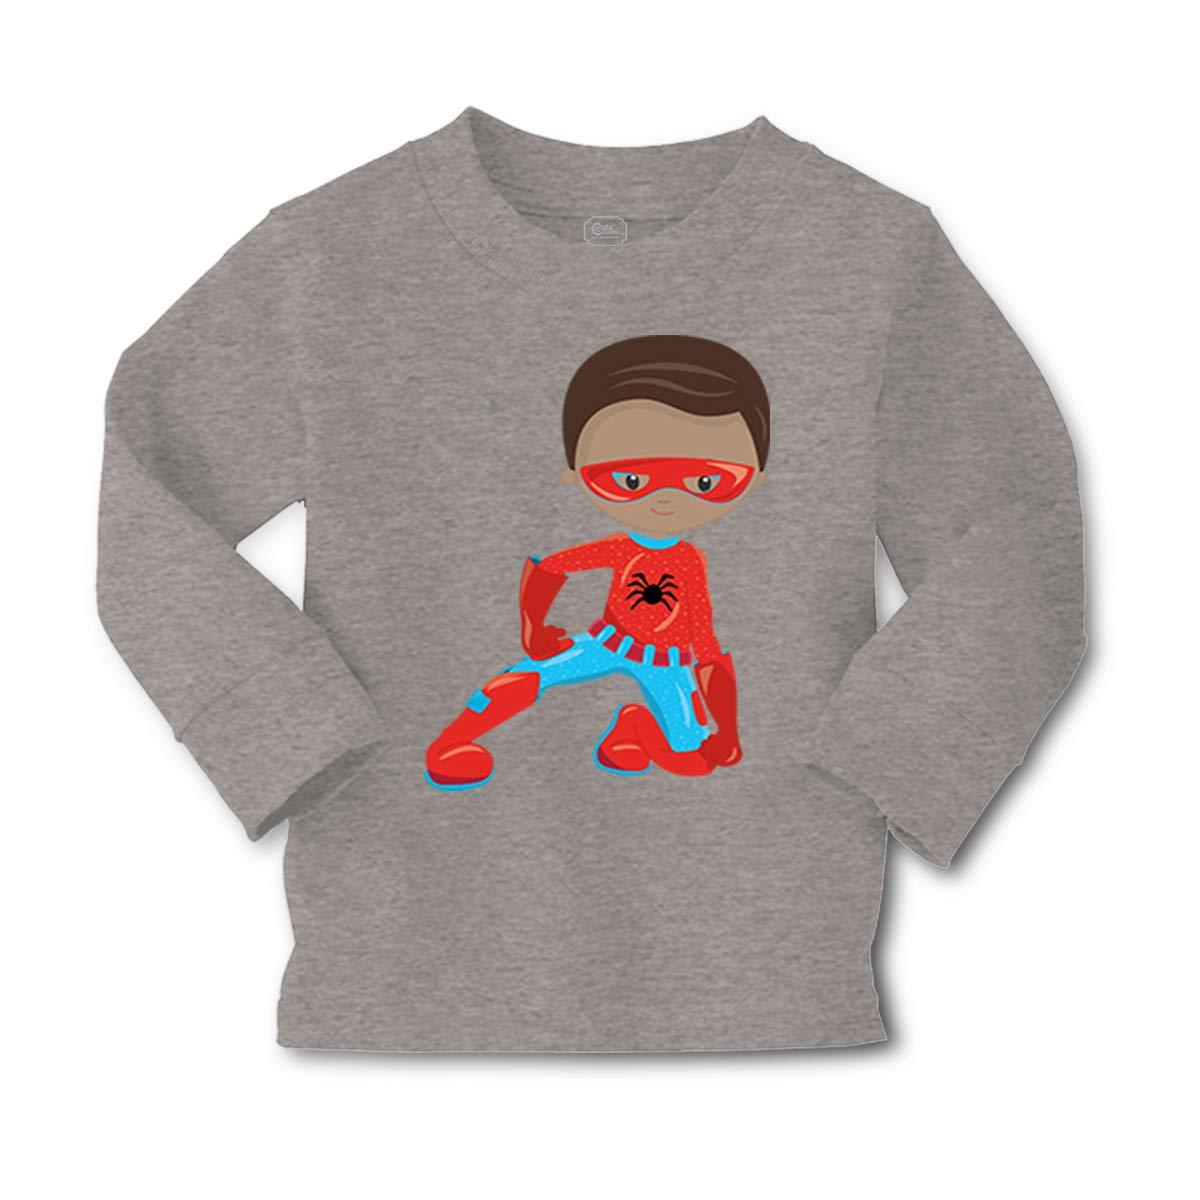 Spider Man Brown B Crewneck Girls T Shirt Tee 3337